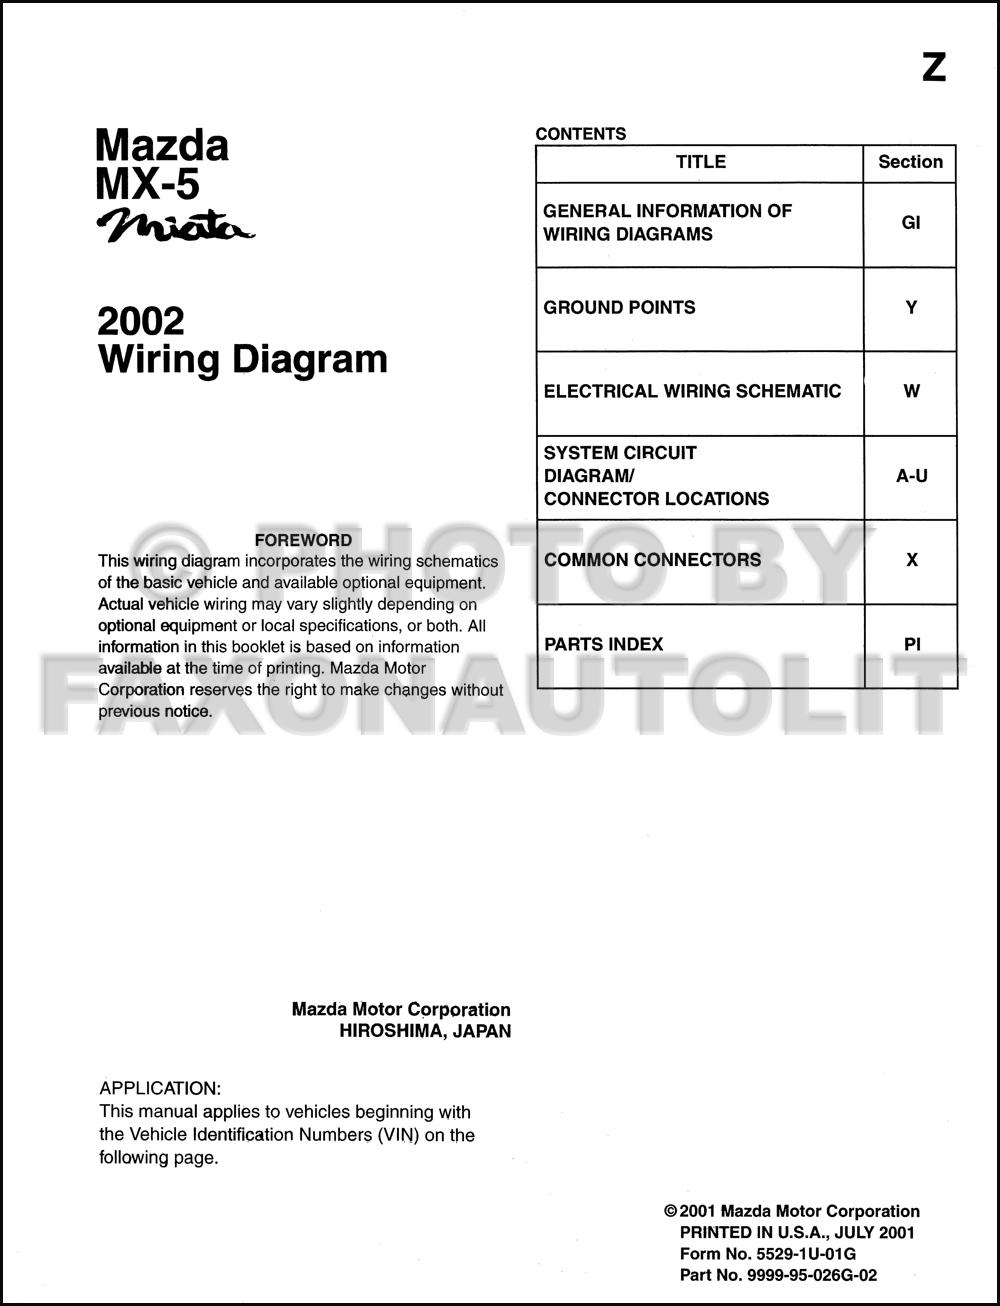 hight resolution of 2002 mazda mx 5 miata wiring diagram manual original 1994 mazda miata wiring diagram 1994 mazda miata wiring diagram